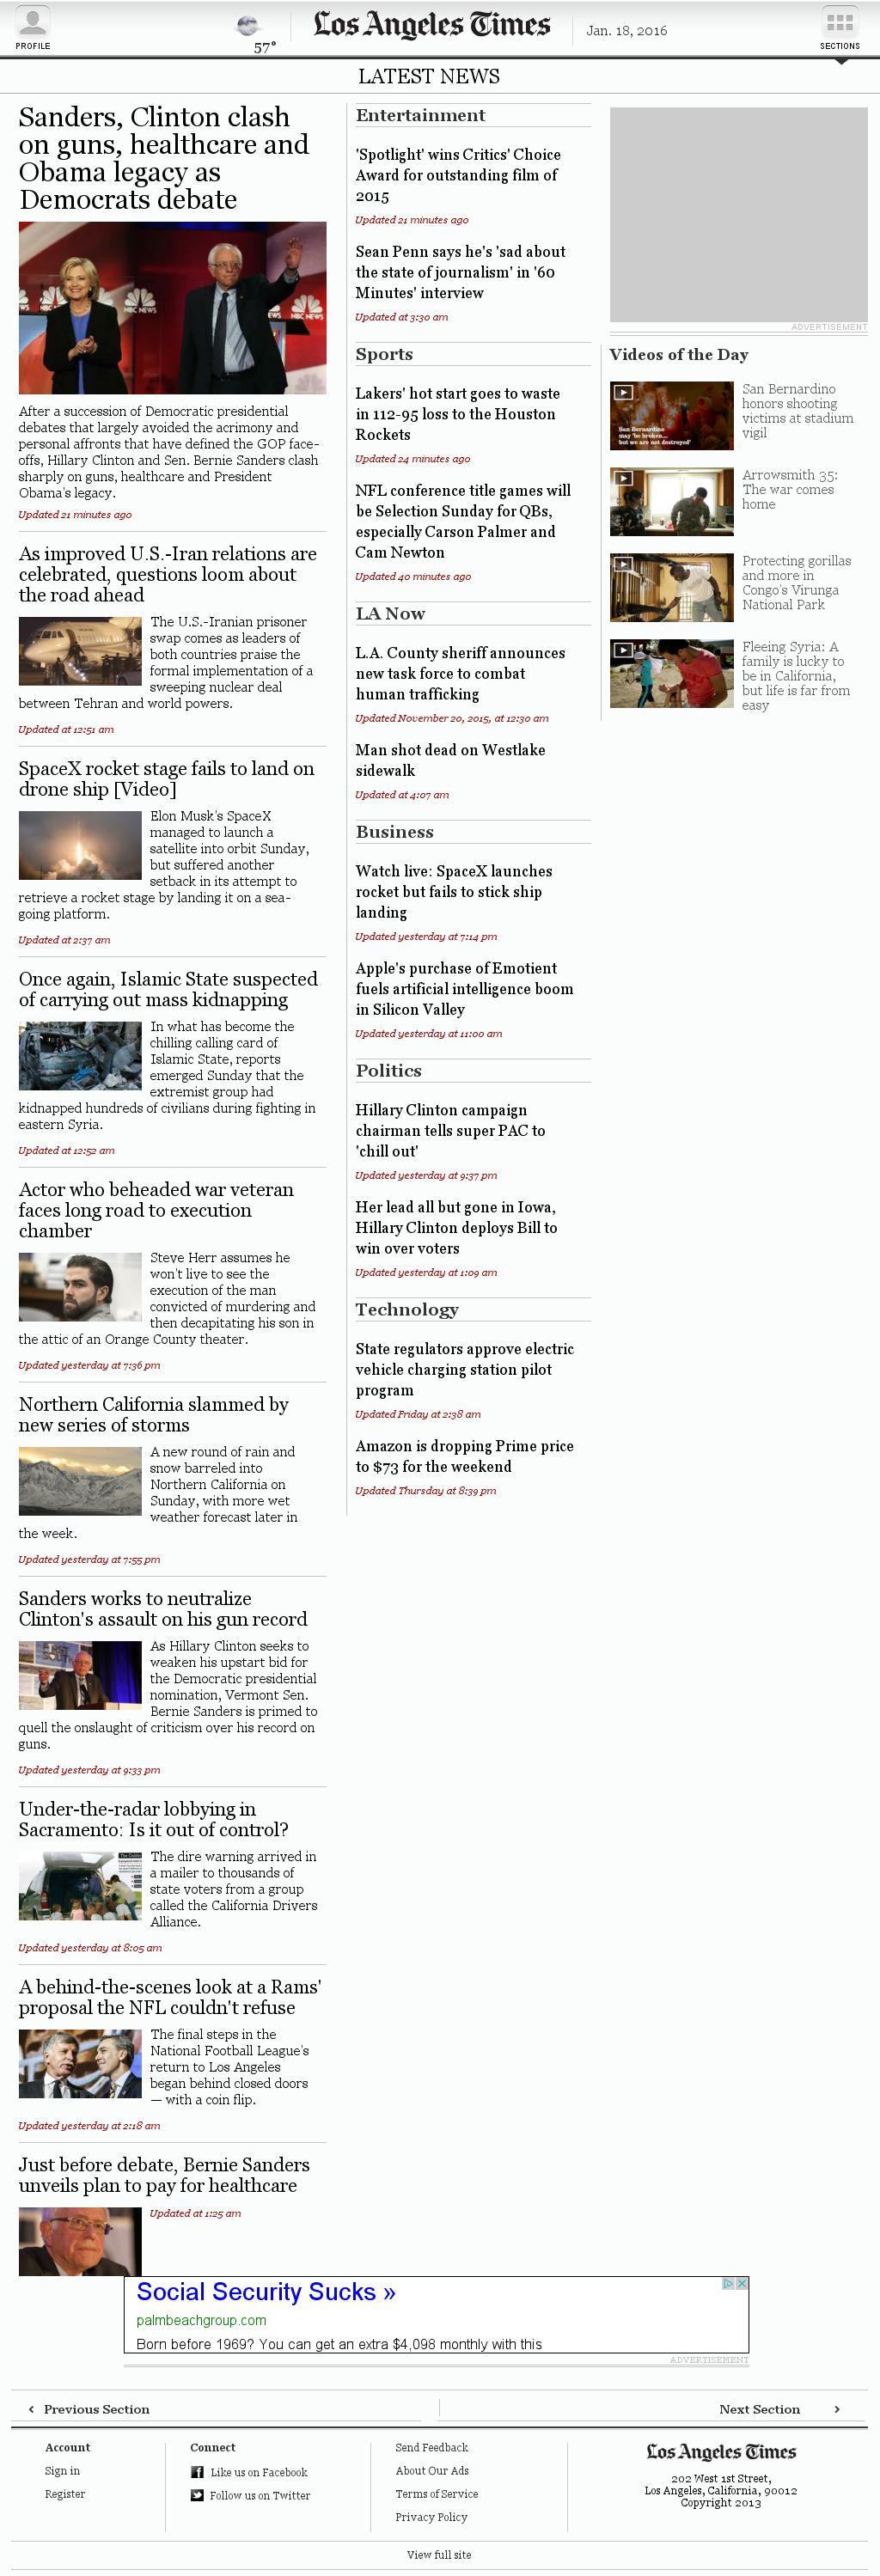 Los Angeles Times at Monday Jan. 18, 2016, 5:15 a.m. UTC